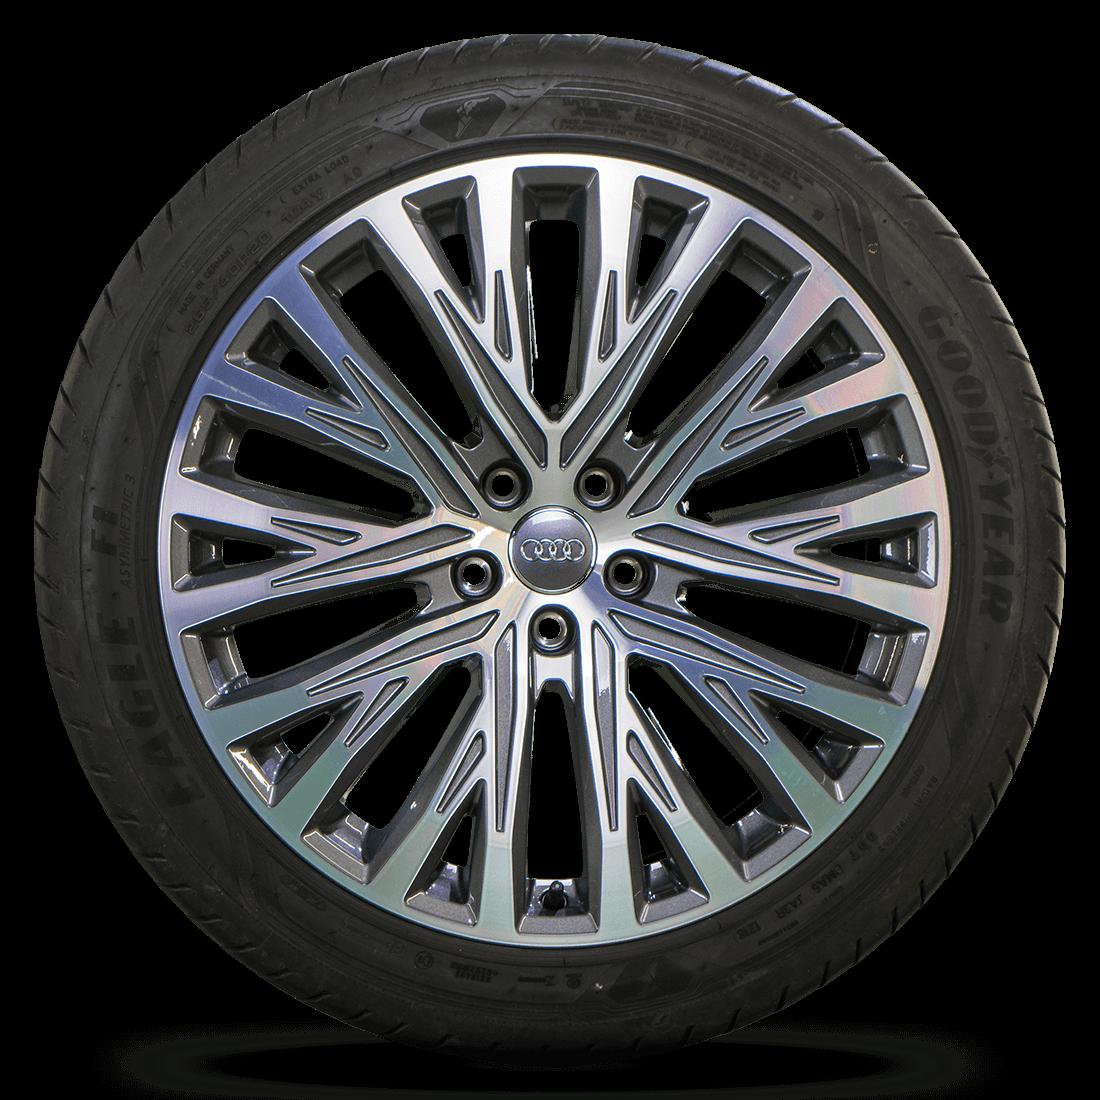 Original Audi 20 Inch Rims A8 S8 4N 4H Aluminum Rims Summer